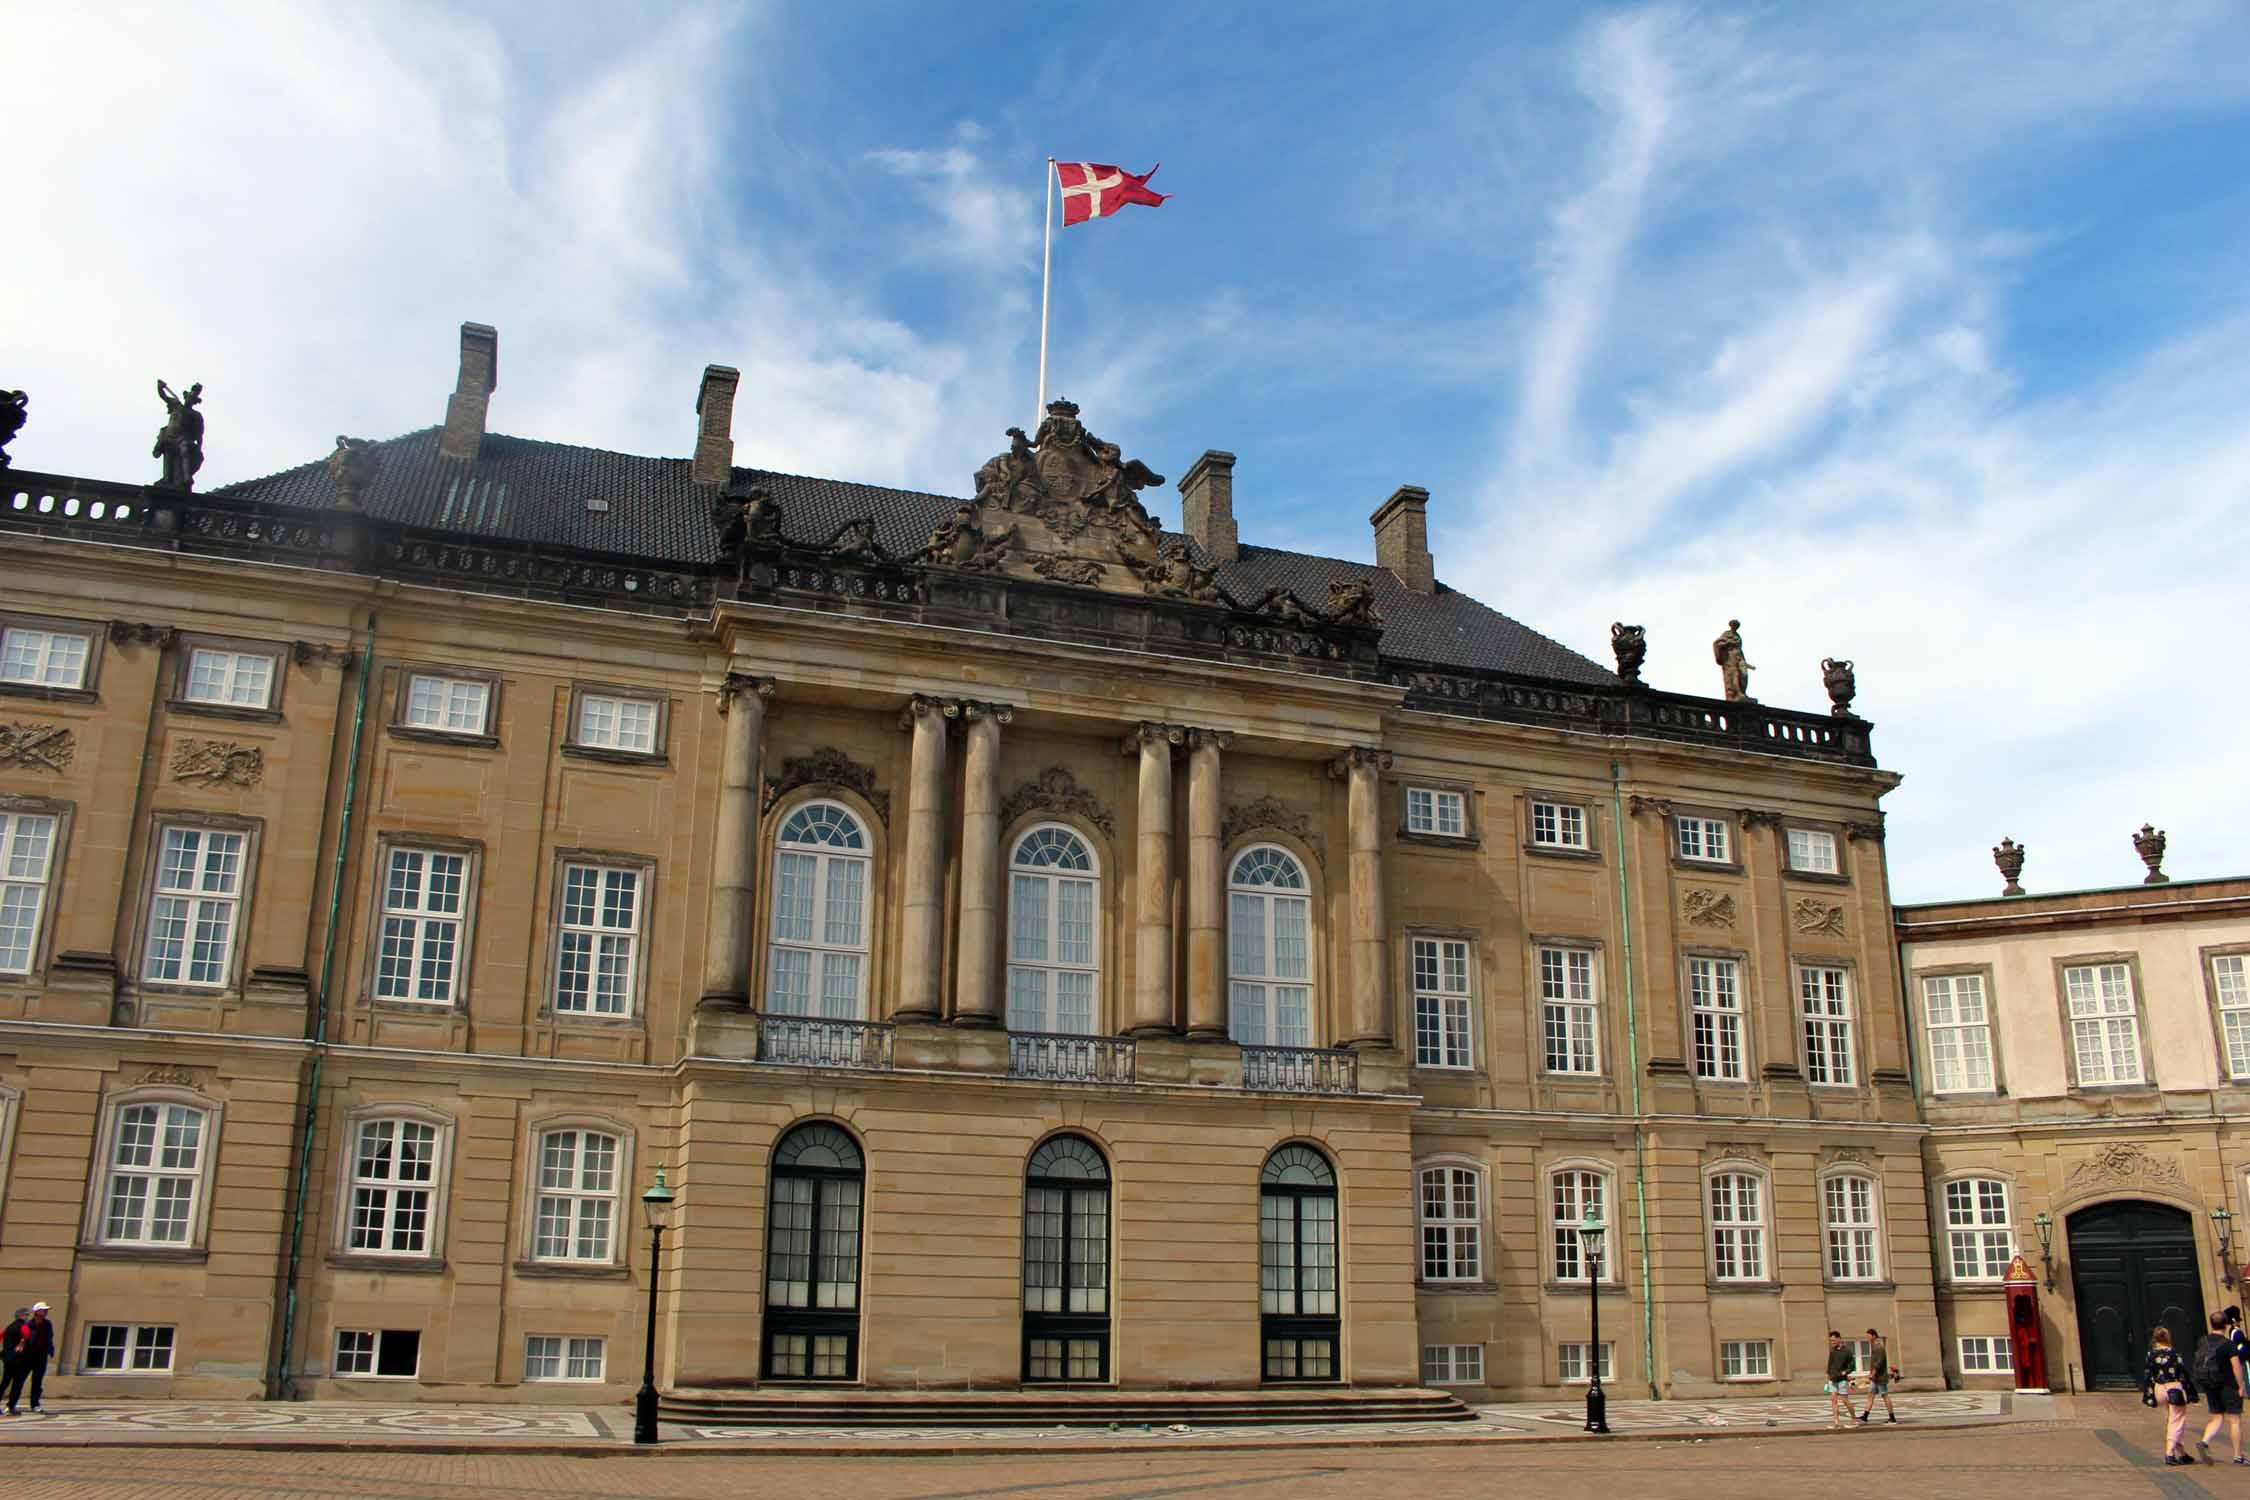 کاخ آمالینبورگ کپنهاگ دانمارک